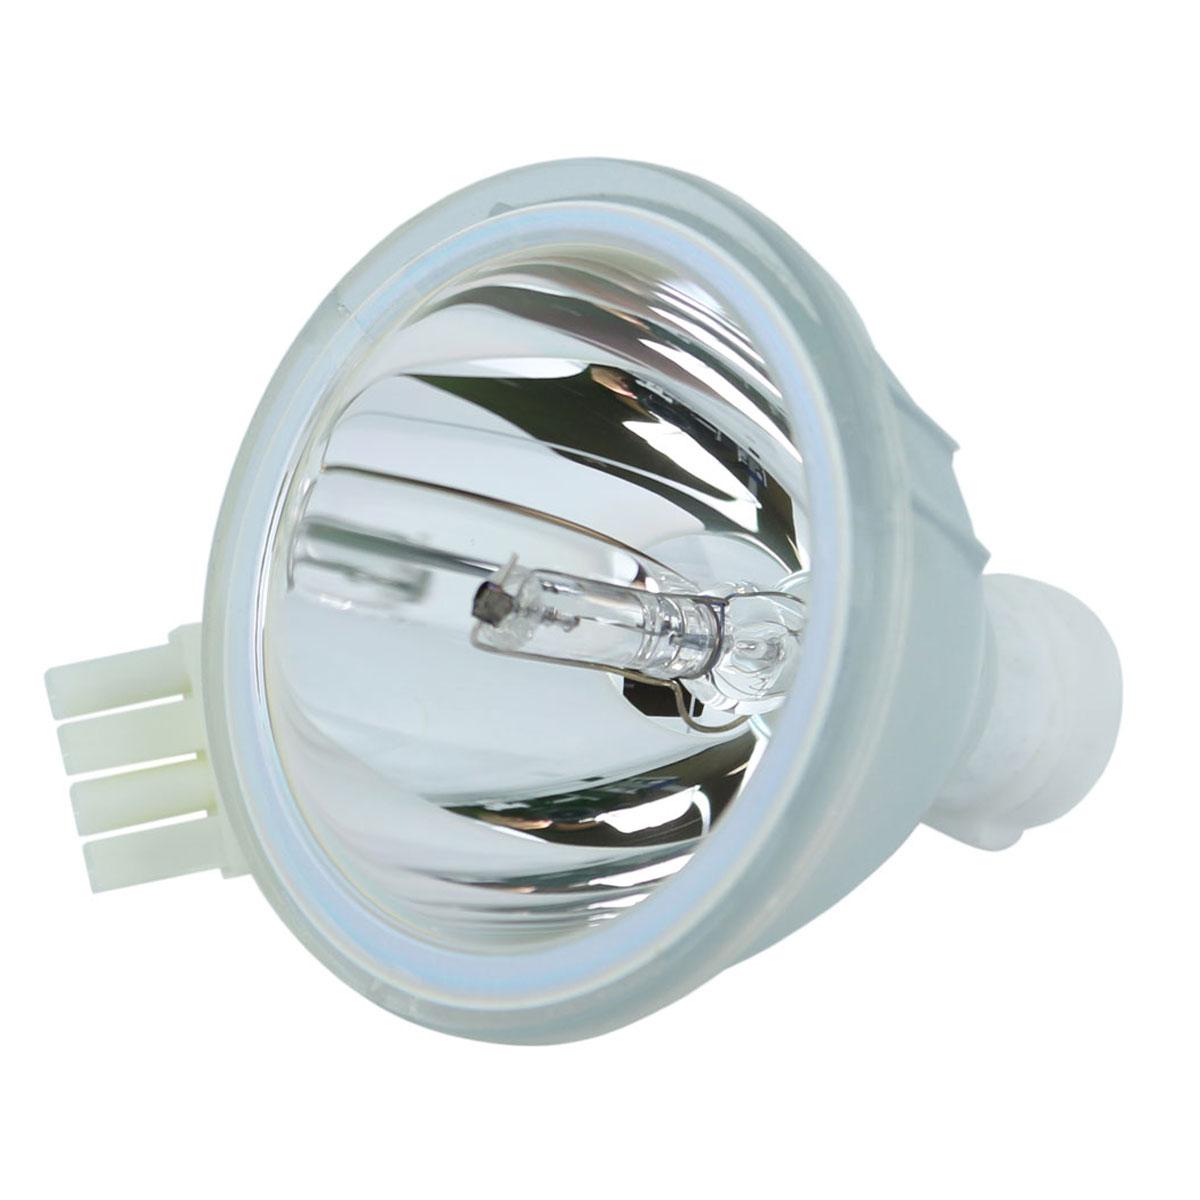 Compatible Bare Bulb TLPLMT10 TLP-LMT10 for TOSHIBA TDP-MT100 / TDP-MT101 Projector Bulb Lamp Without Housing Free Shipping free shipping projector bare lamp tlplw11 for toshiba tlp x2000edu tlp xc2500au tlp xe30u projector 3pcs lot